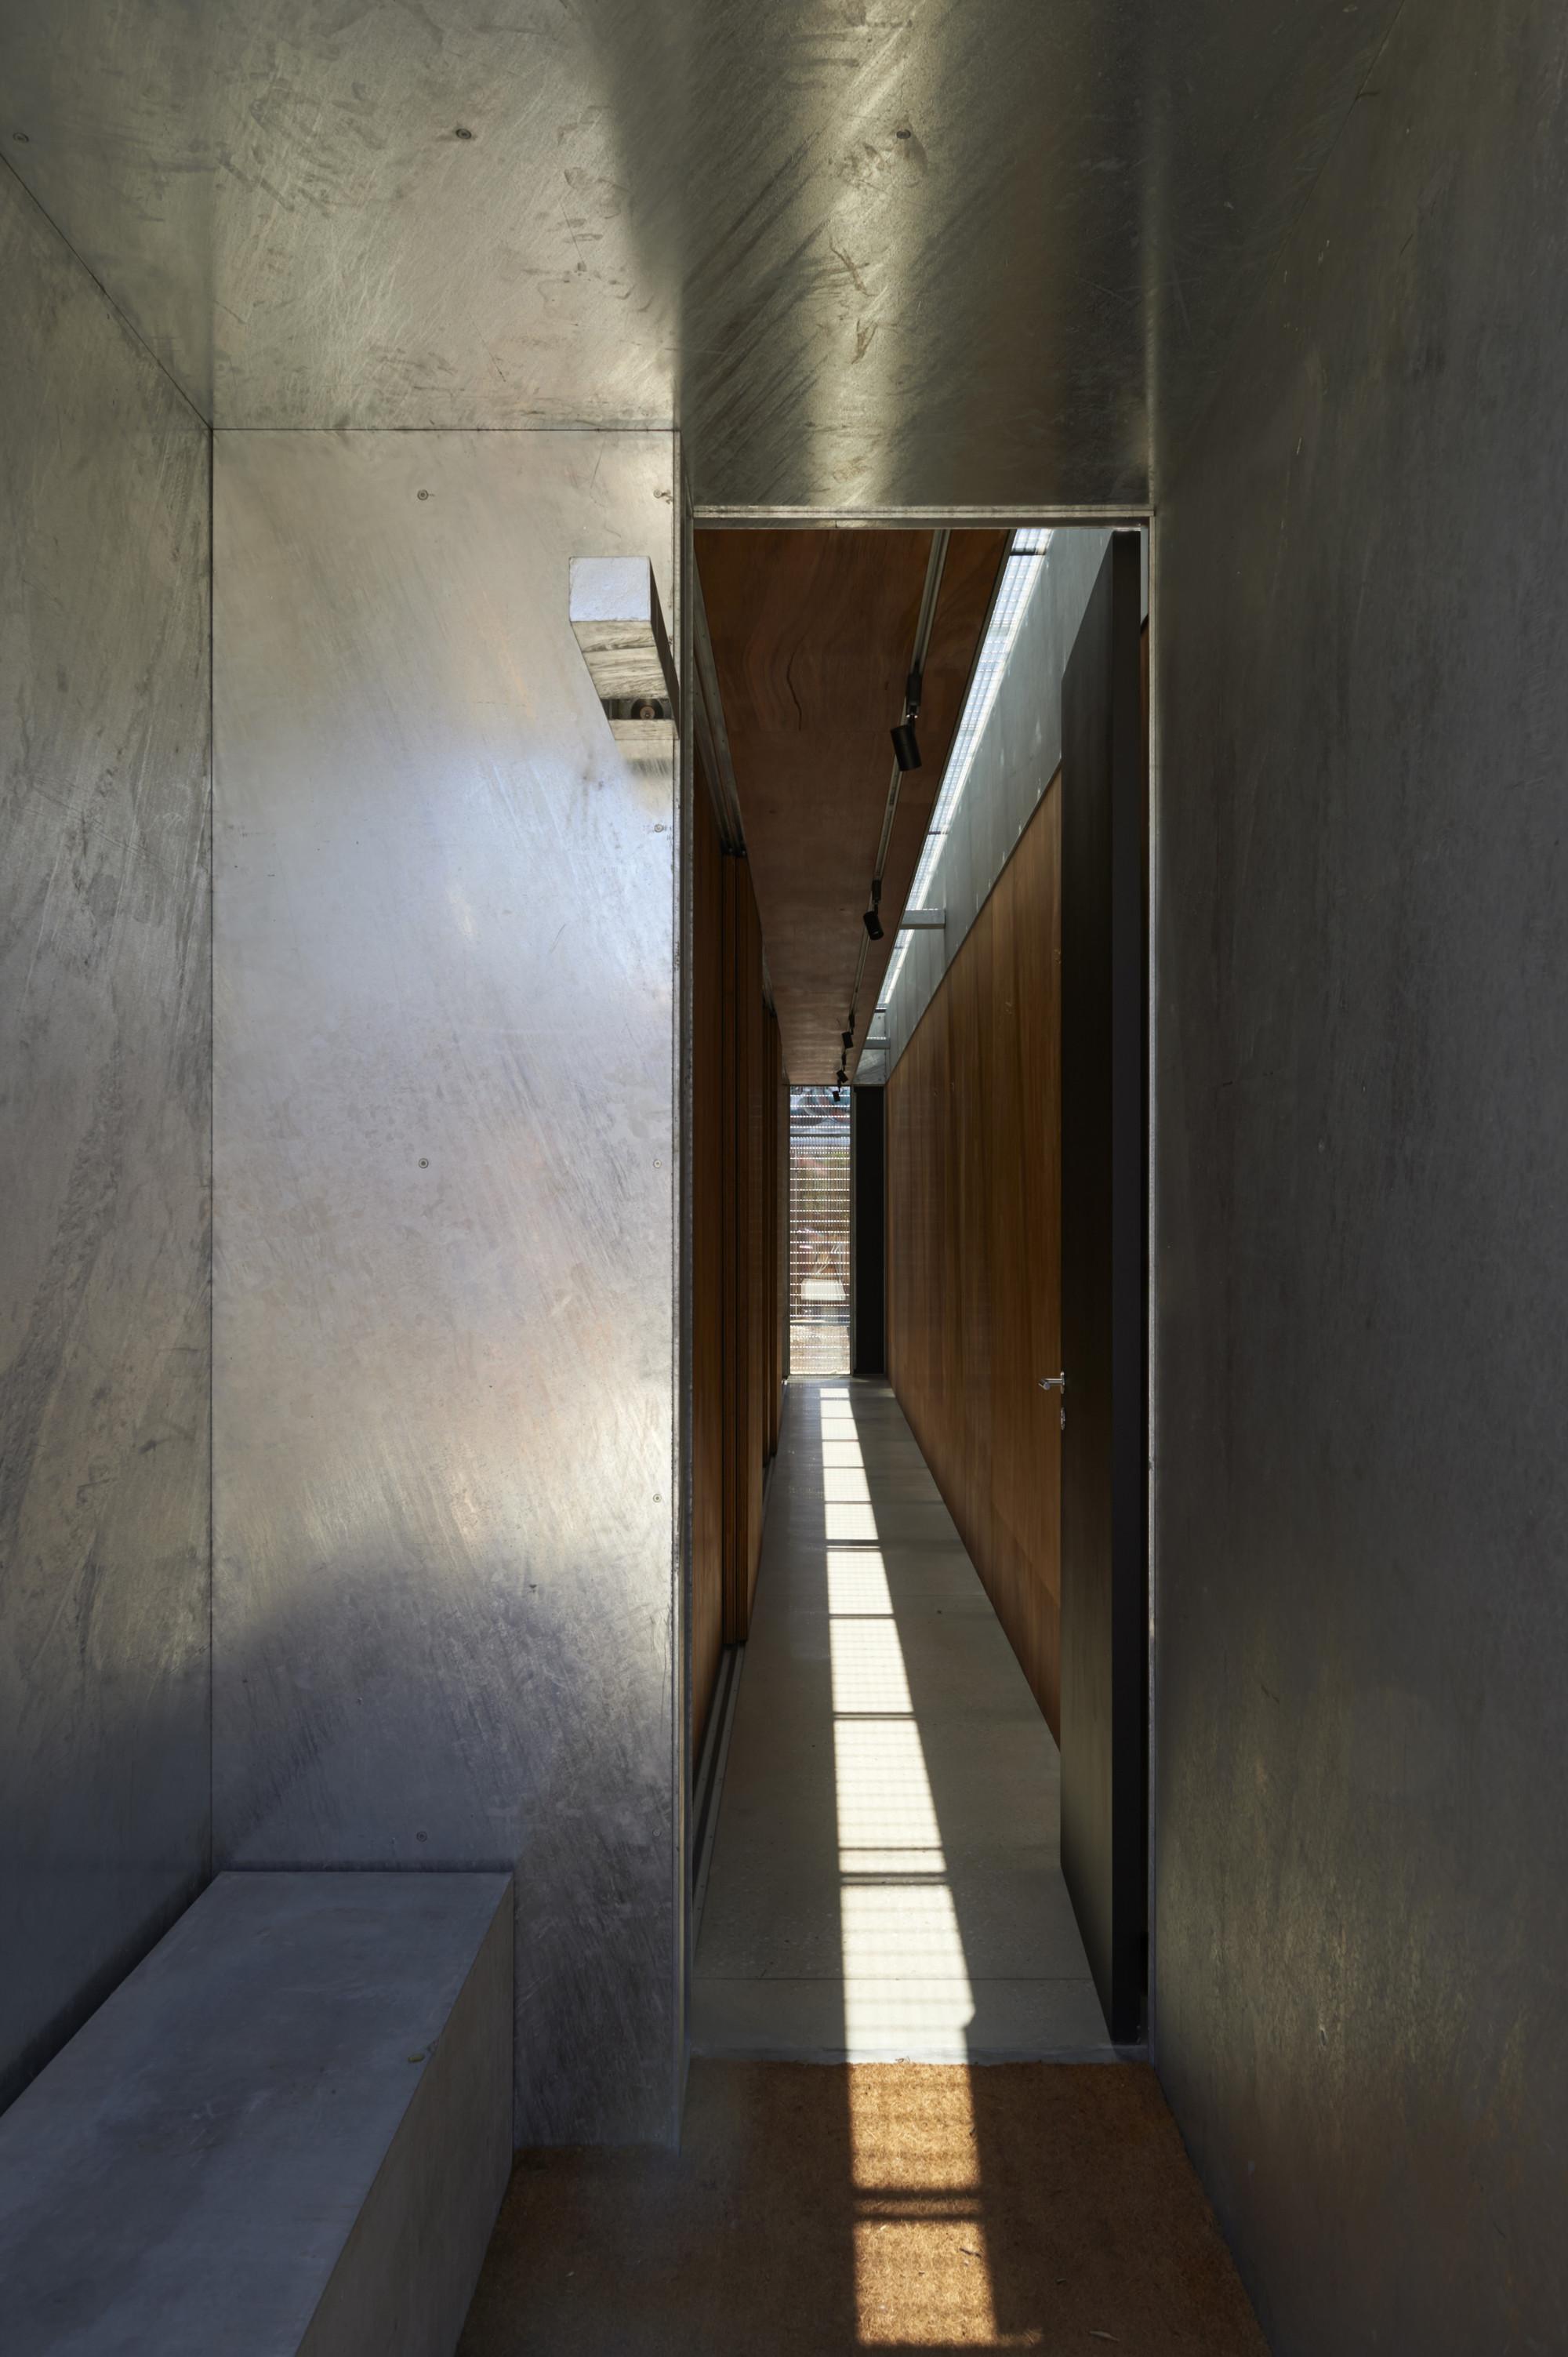 Edward Street House / Sean Godsell Architects